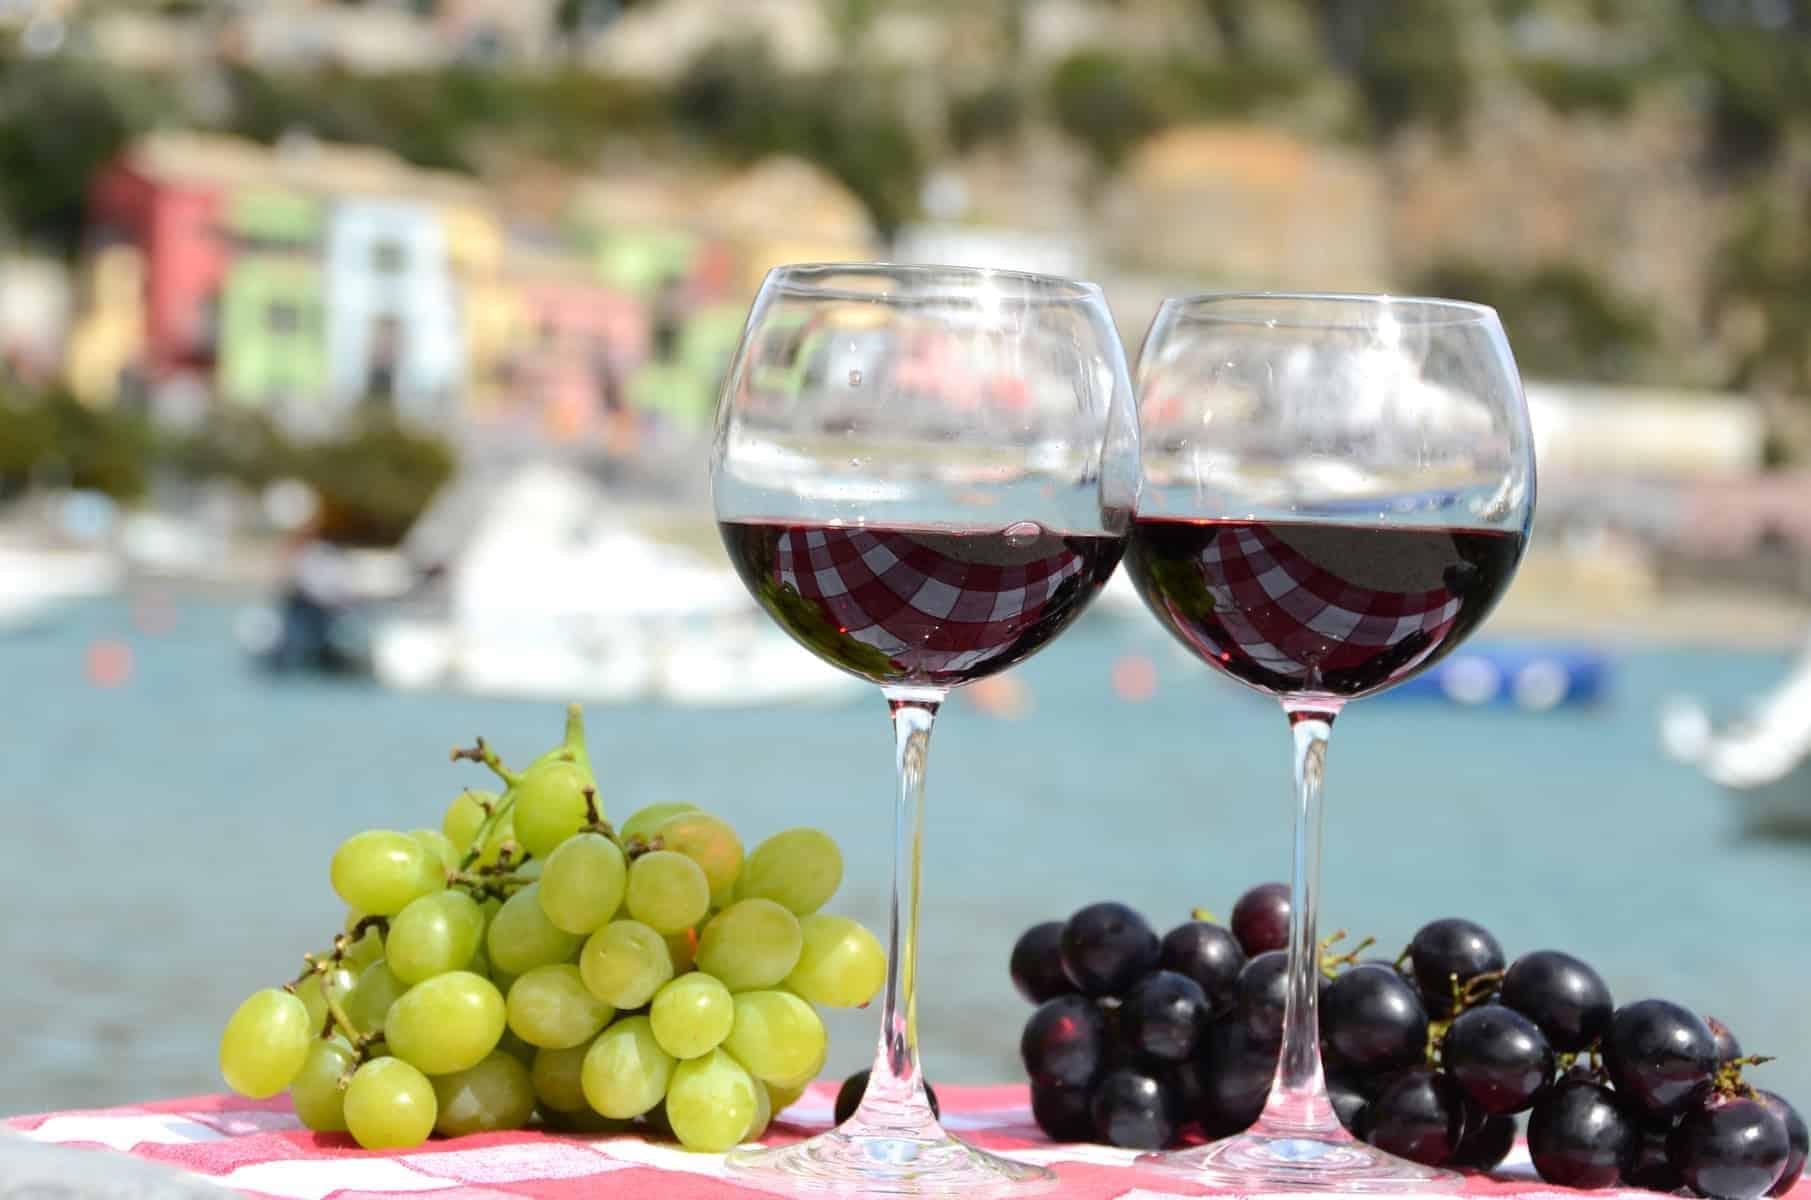 Lækker vin i Portvenere, Liguria Italien